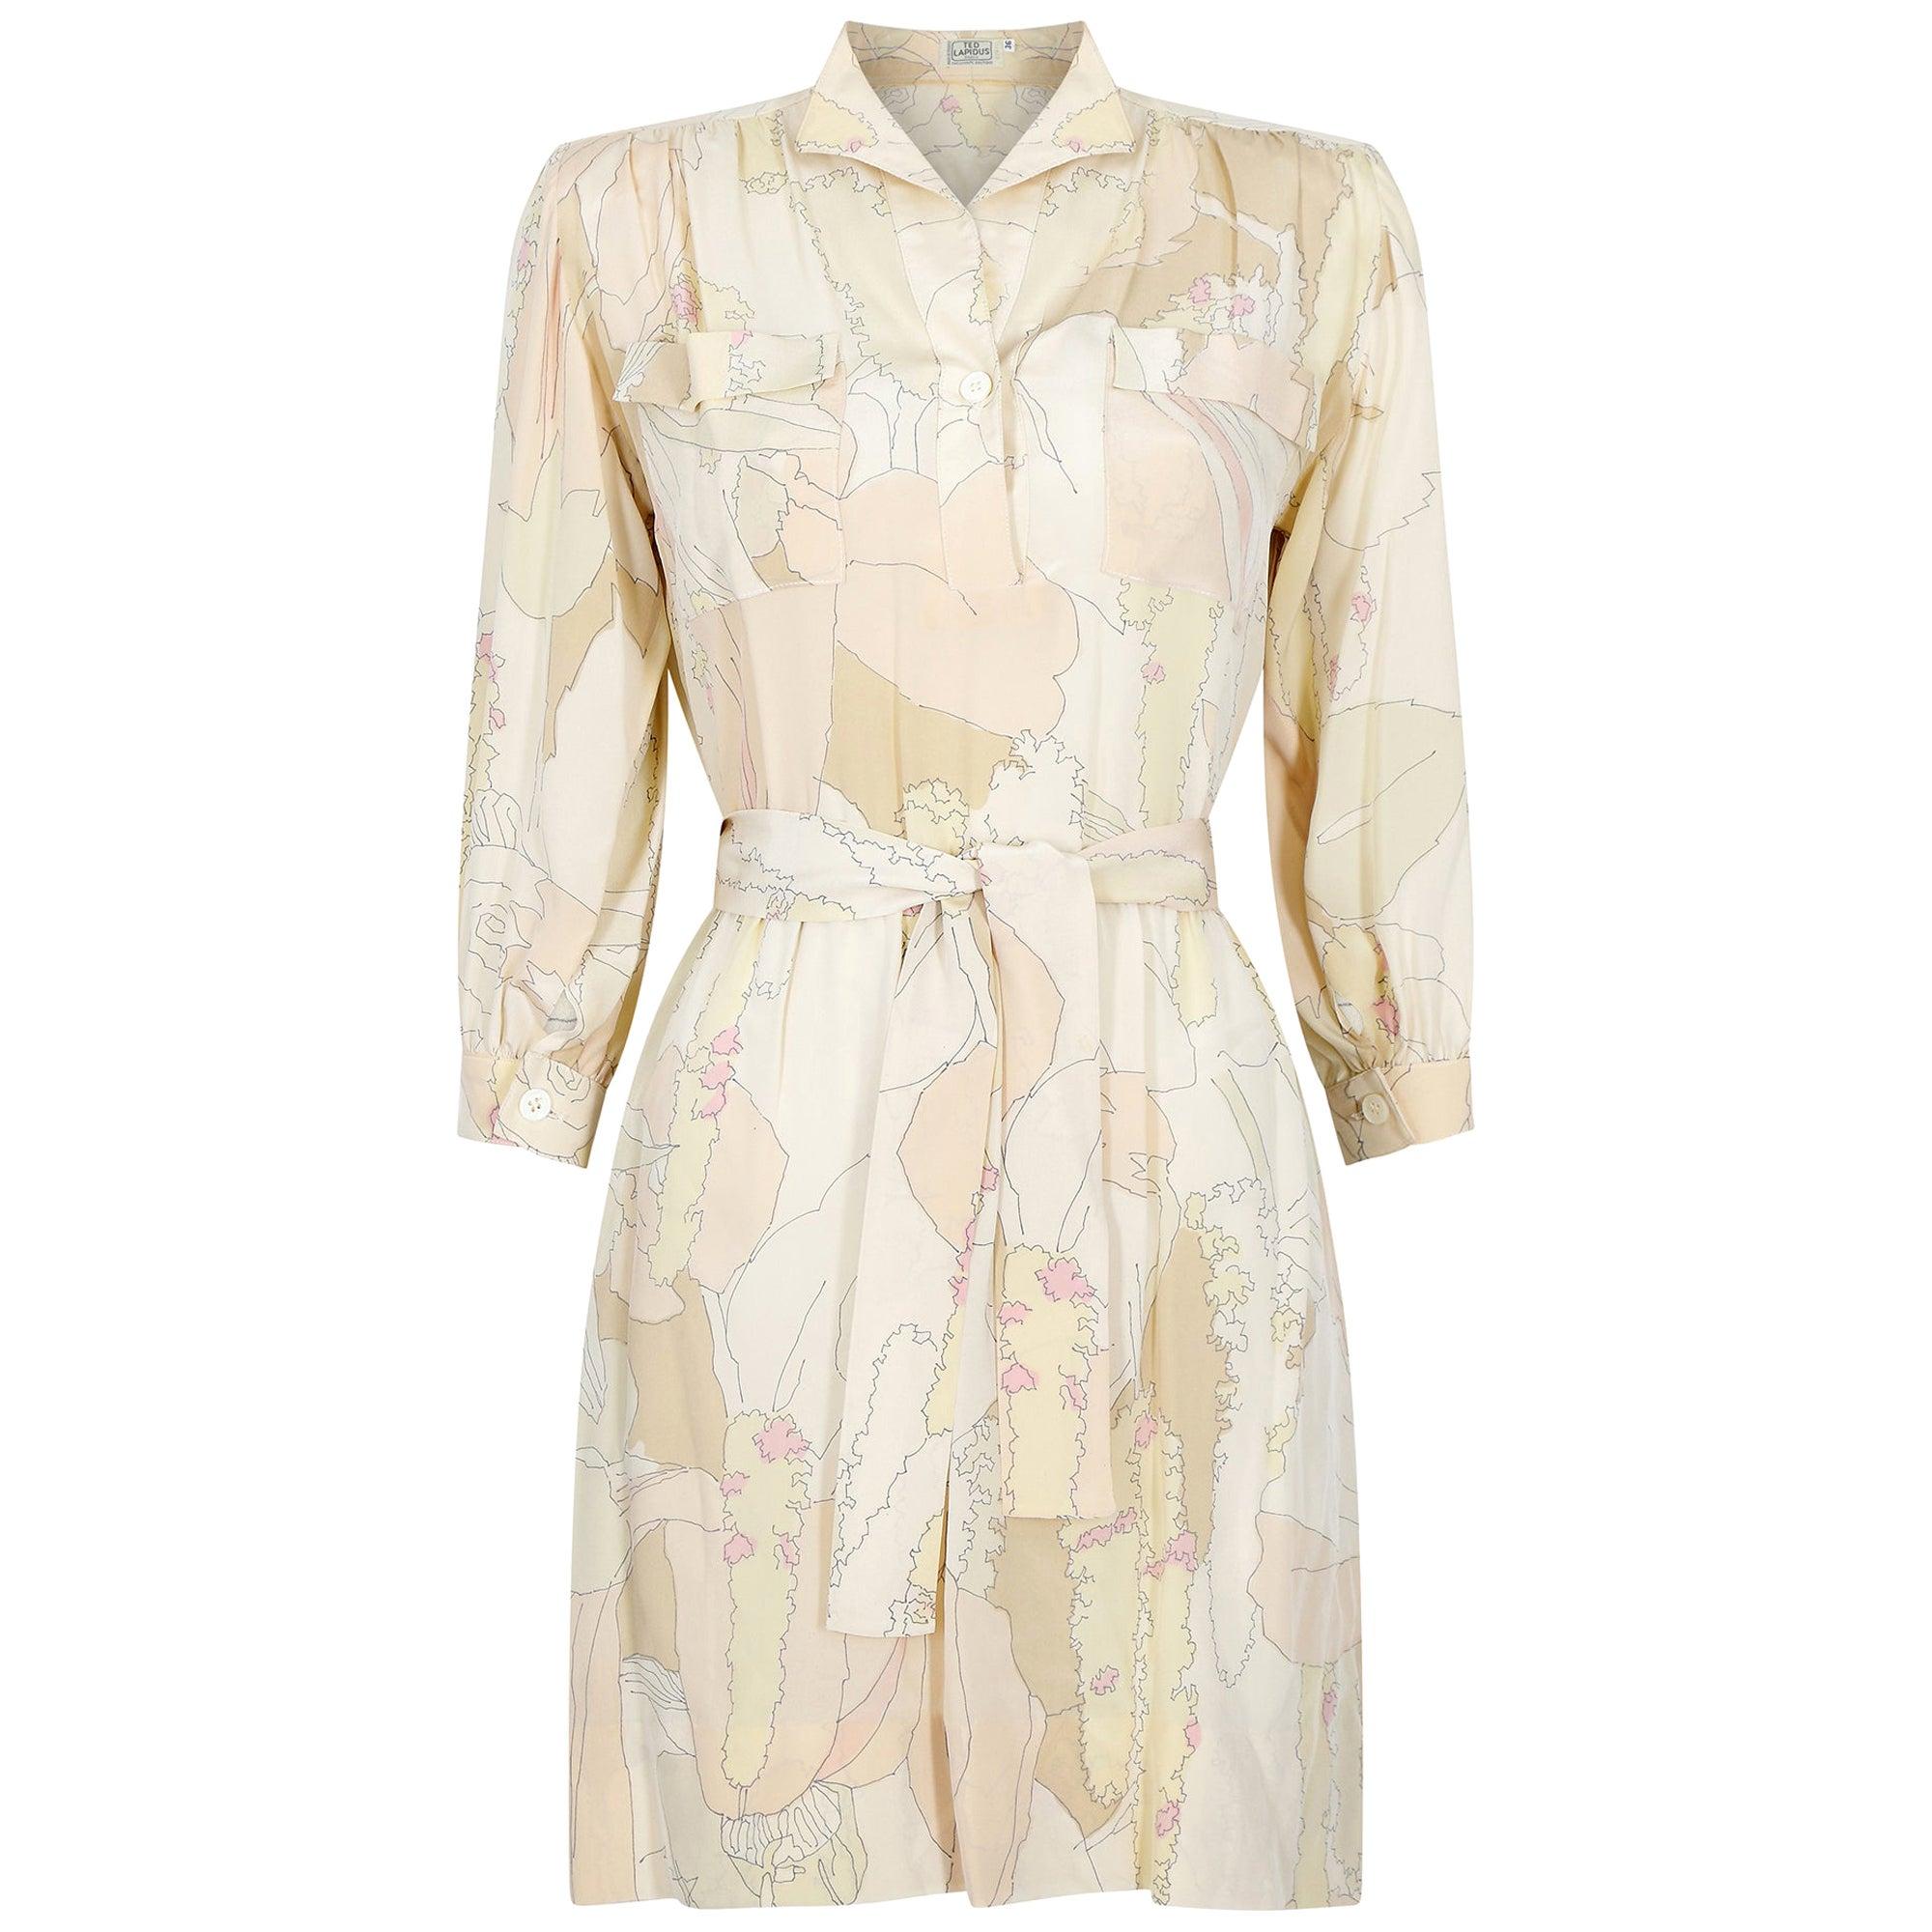 1970s Ted Lapidus Silk Shirt Dress